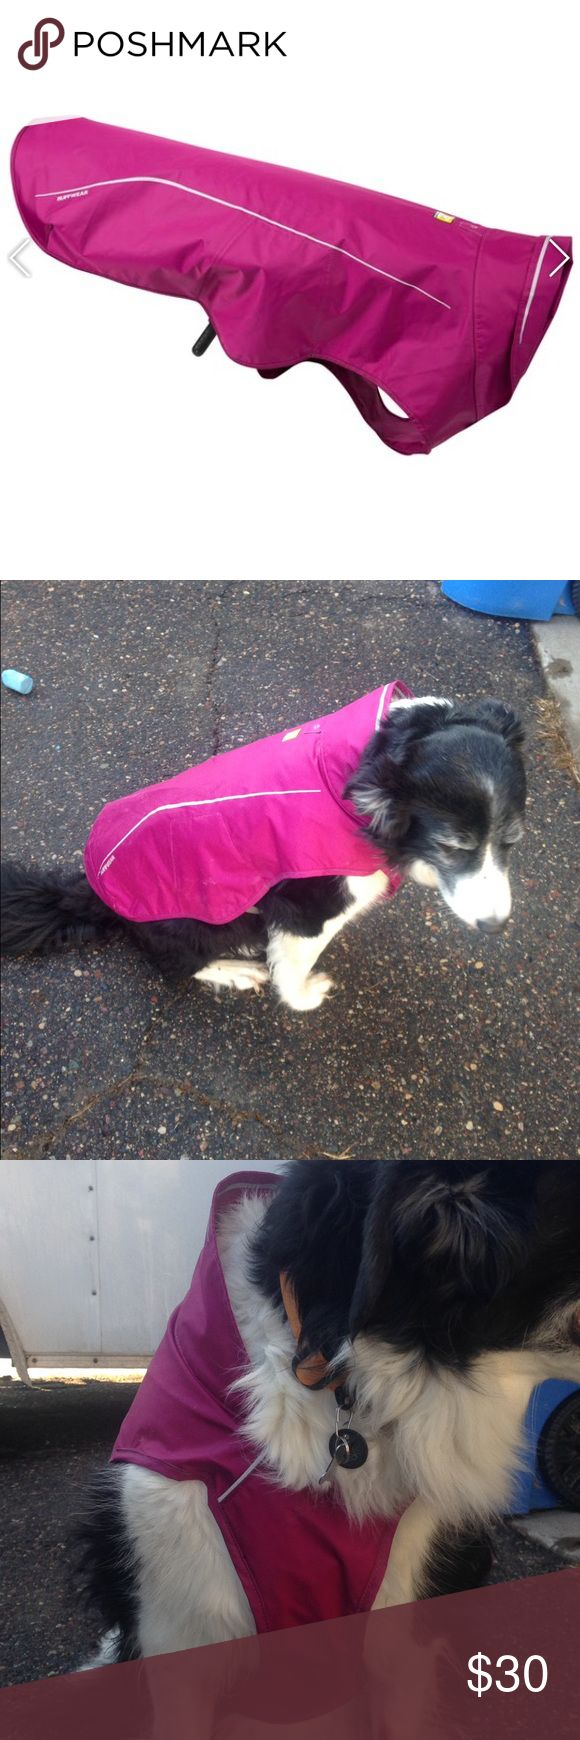 1000+ ideas about Ladies Raincoats on Pinterest  Max mara, Ladies parka and  # Sunshower Dog_004942